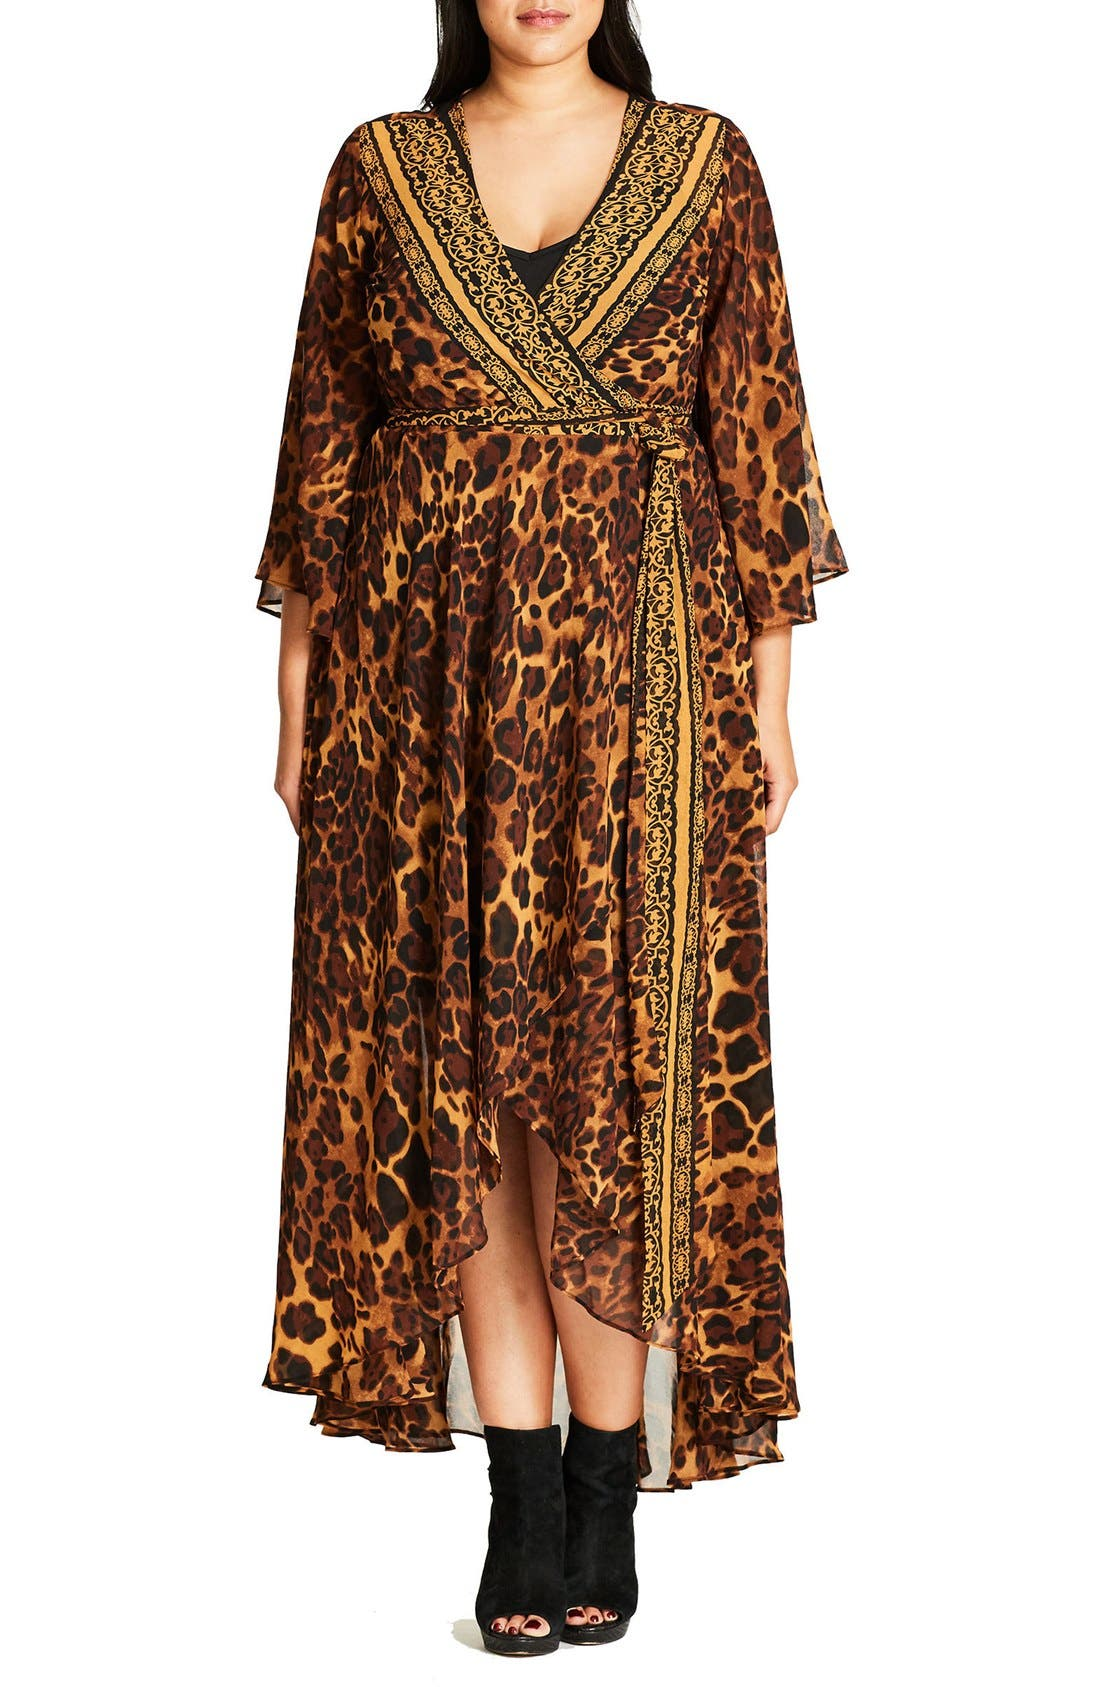 CITY CHIC Luxe Leopard Maxi Wrap Dress